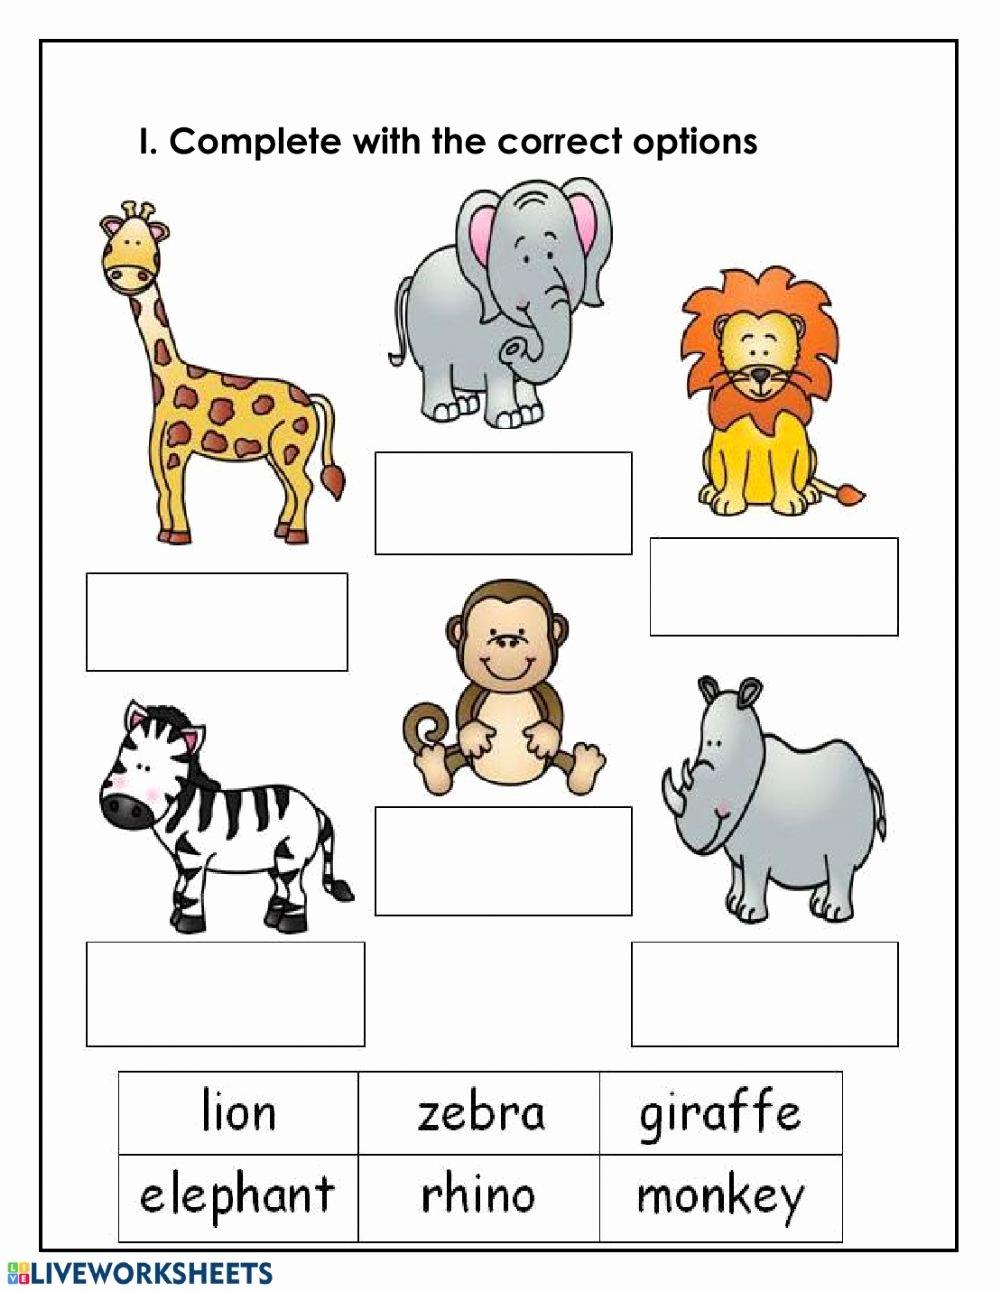 Zoo Animal Worksheets for Preschoolers New Zoo Animals Interactive Worksheet